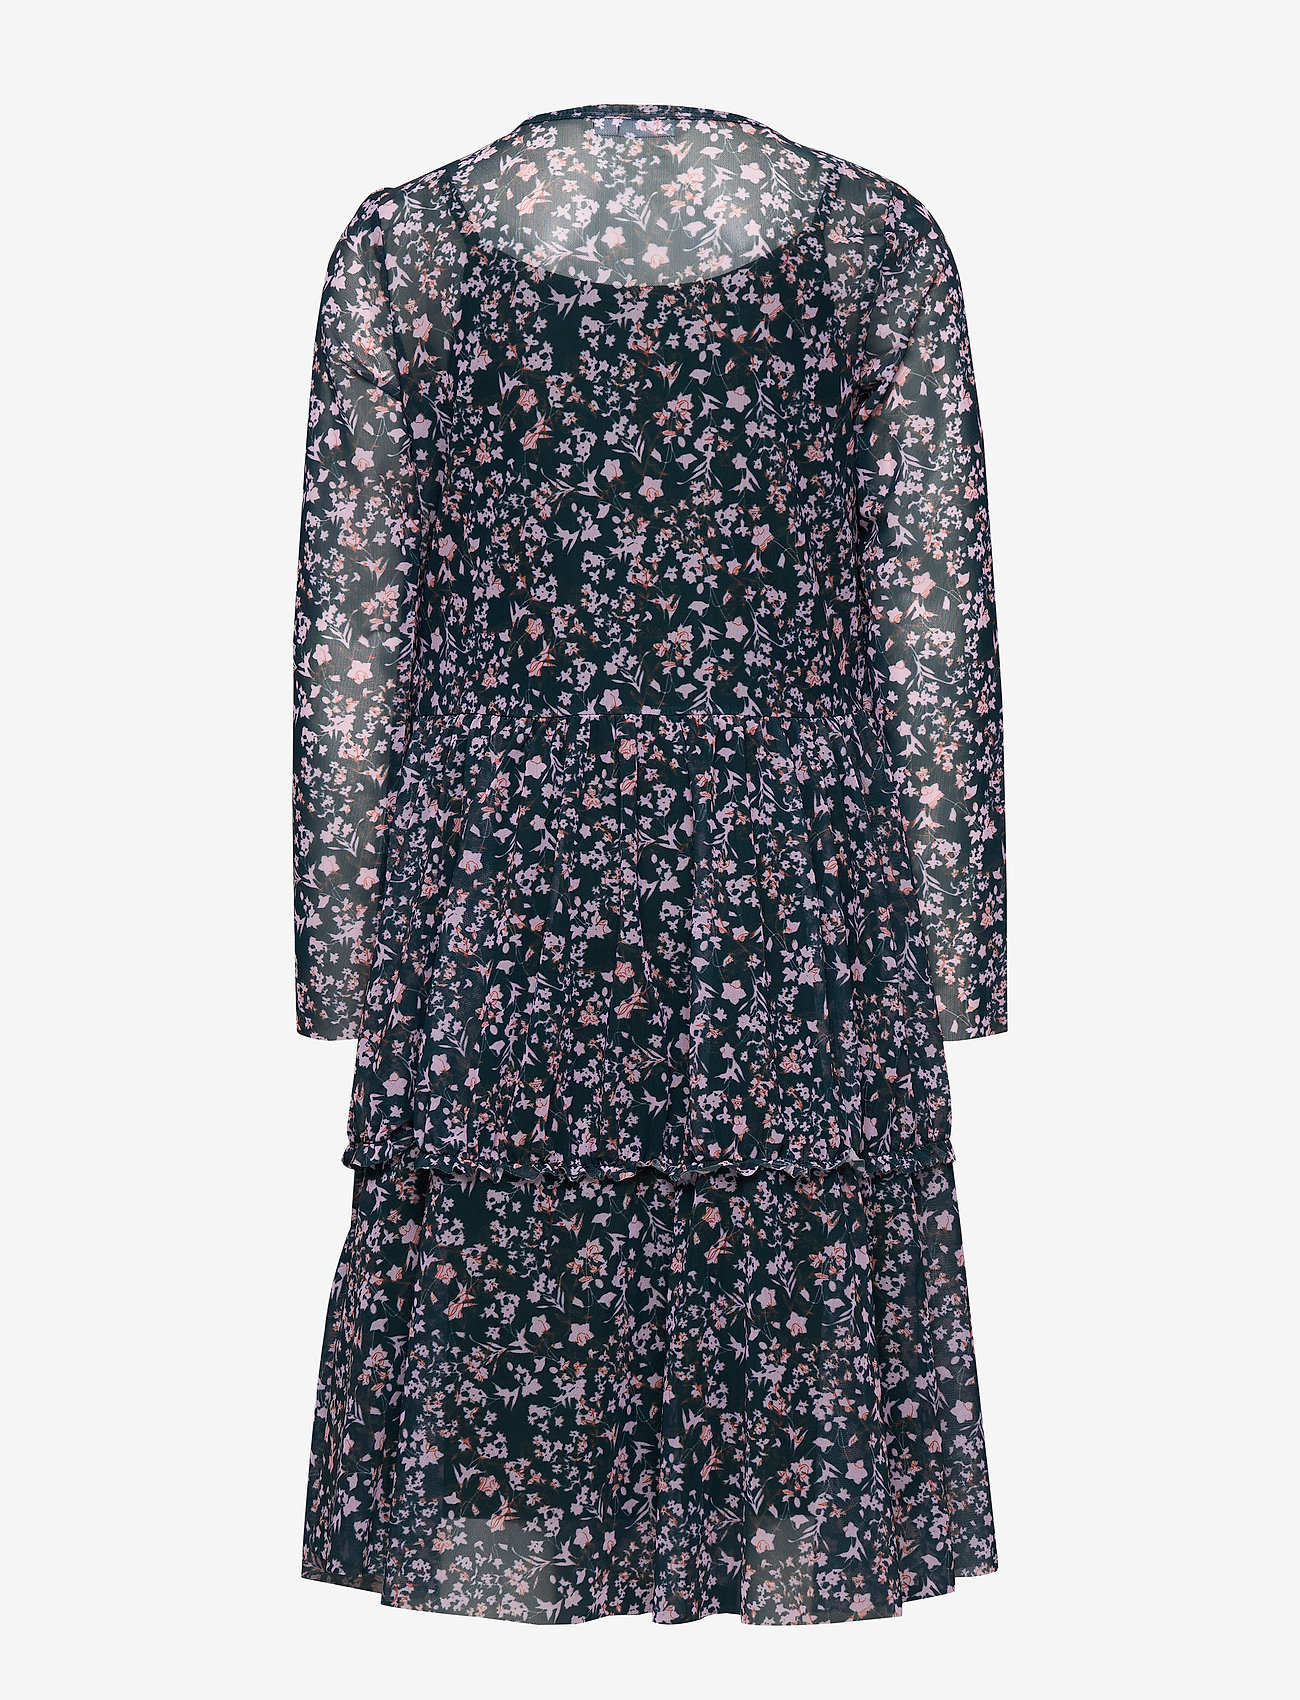 name it - NKFKLARISA LS DRESS - robes - darkest spruce - 1